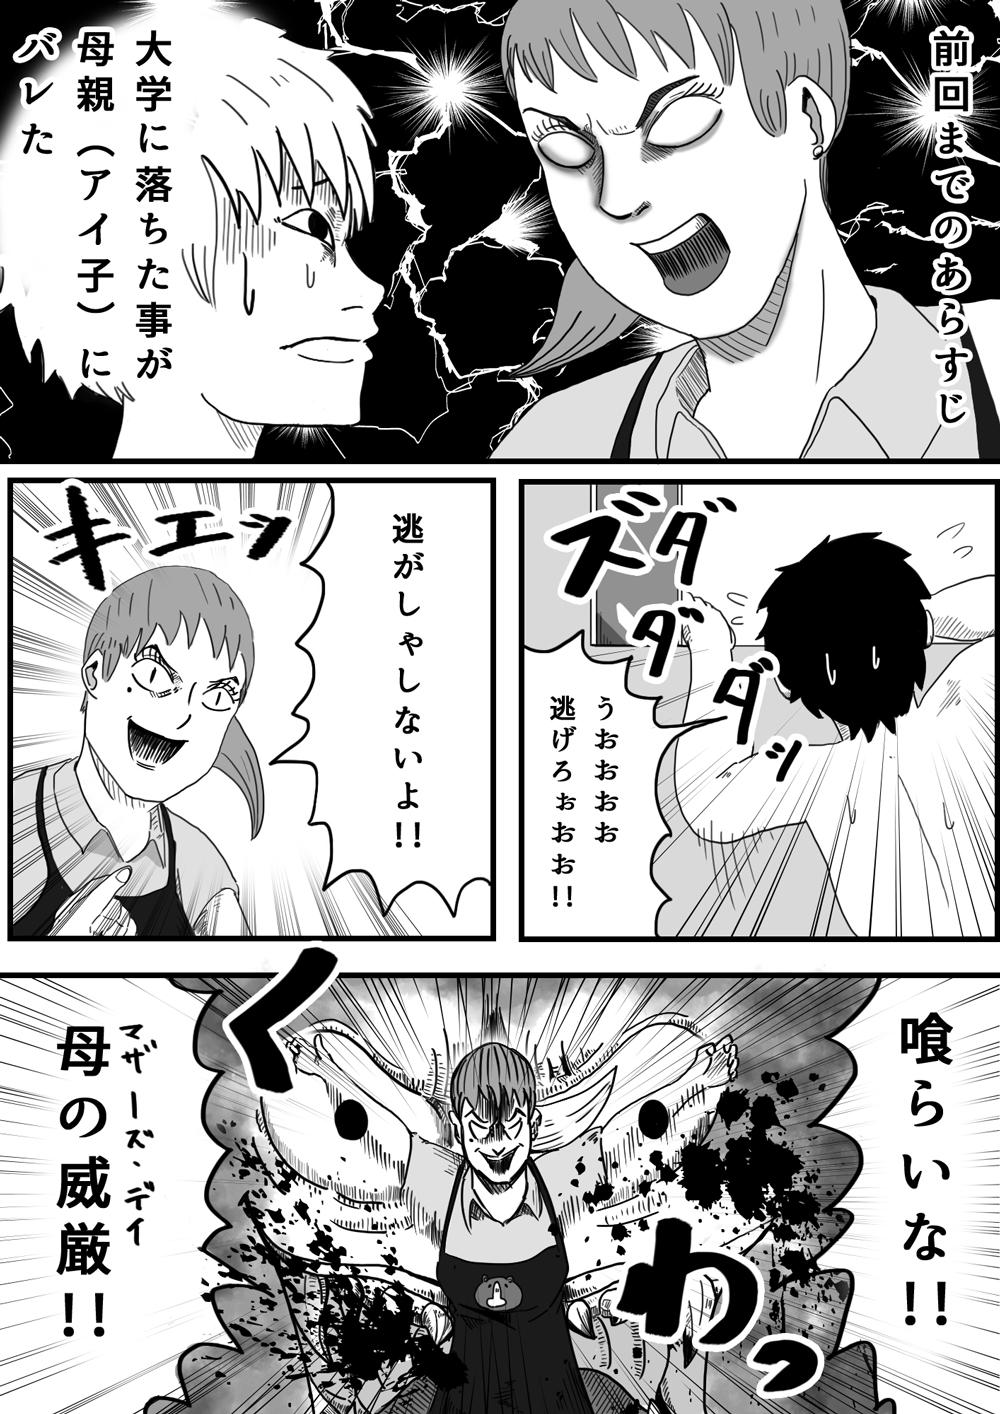 arnolds-hasegawa-004-1